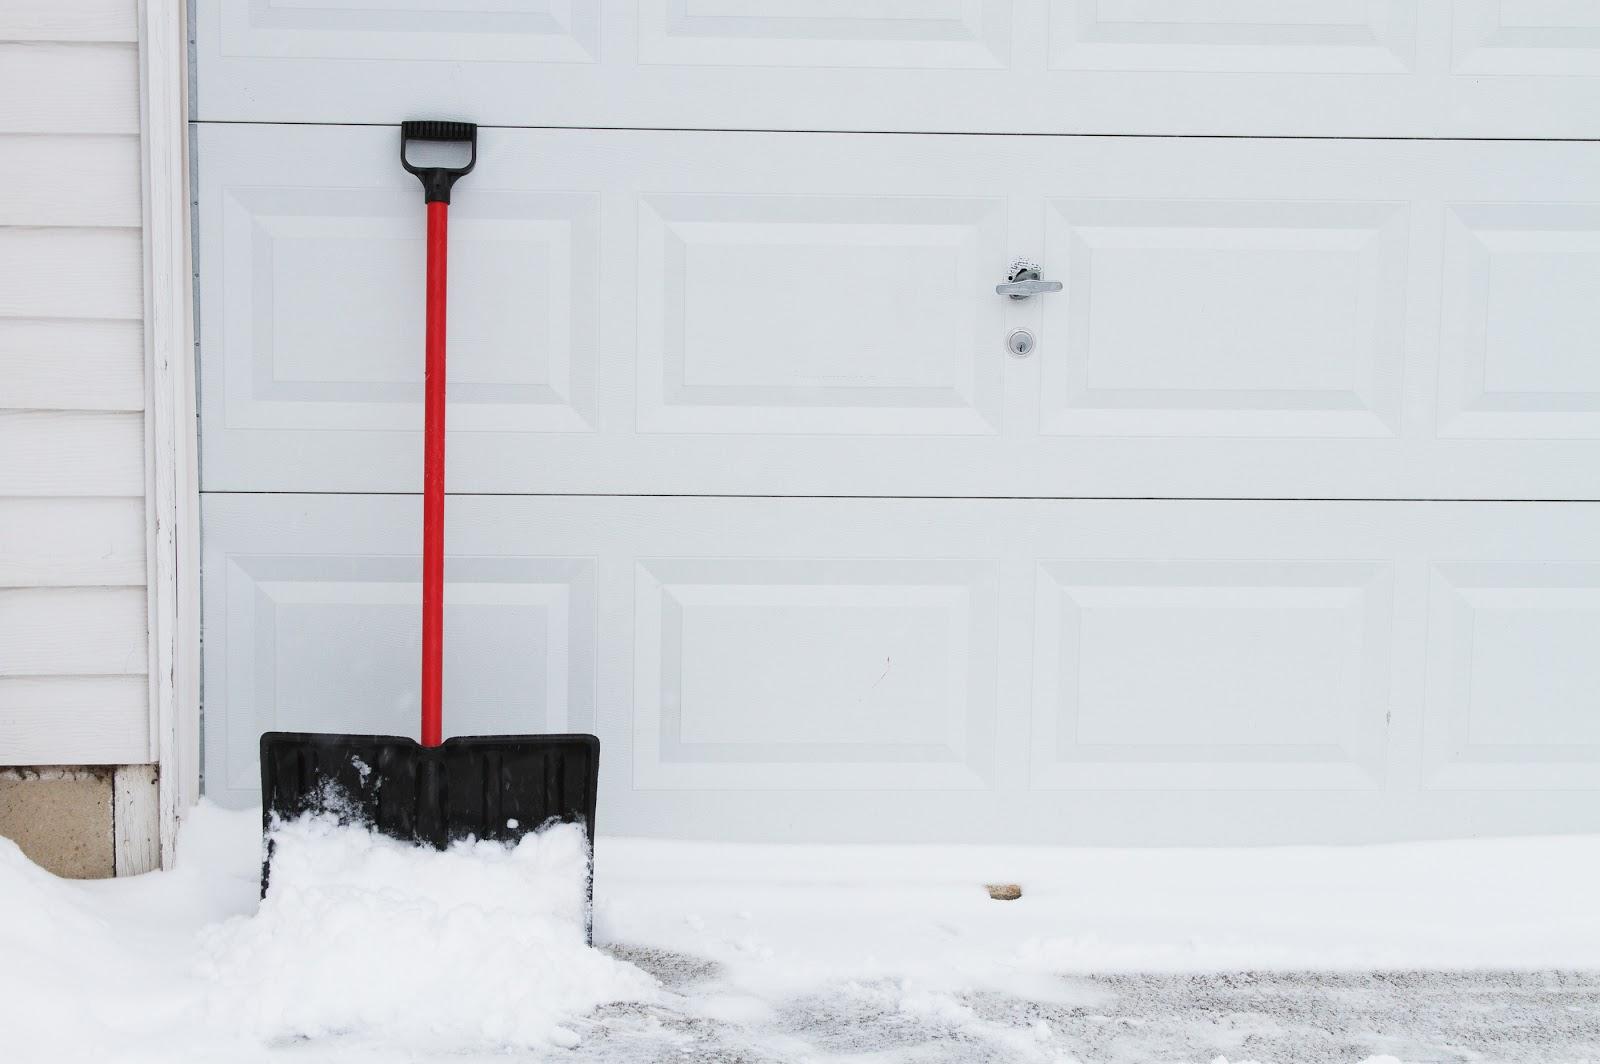 snow-shovel-white-garage-door